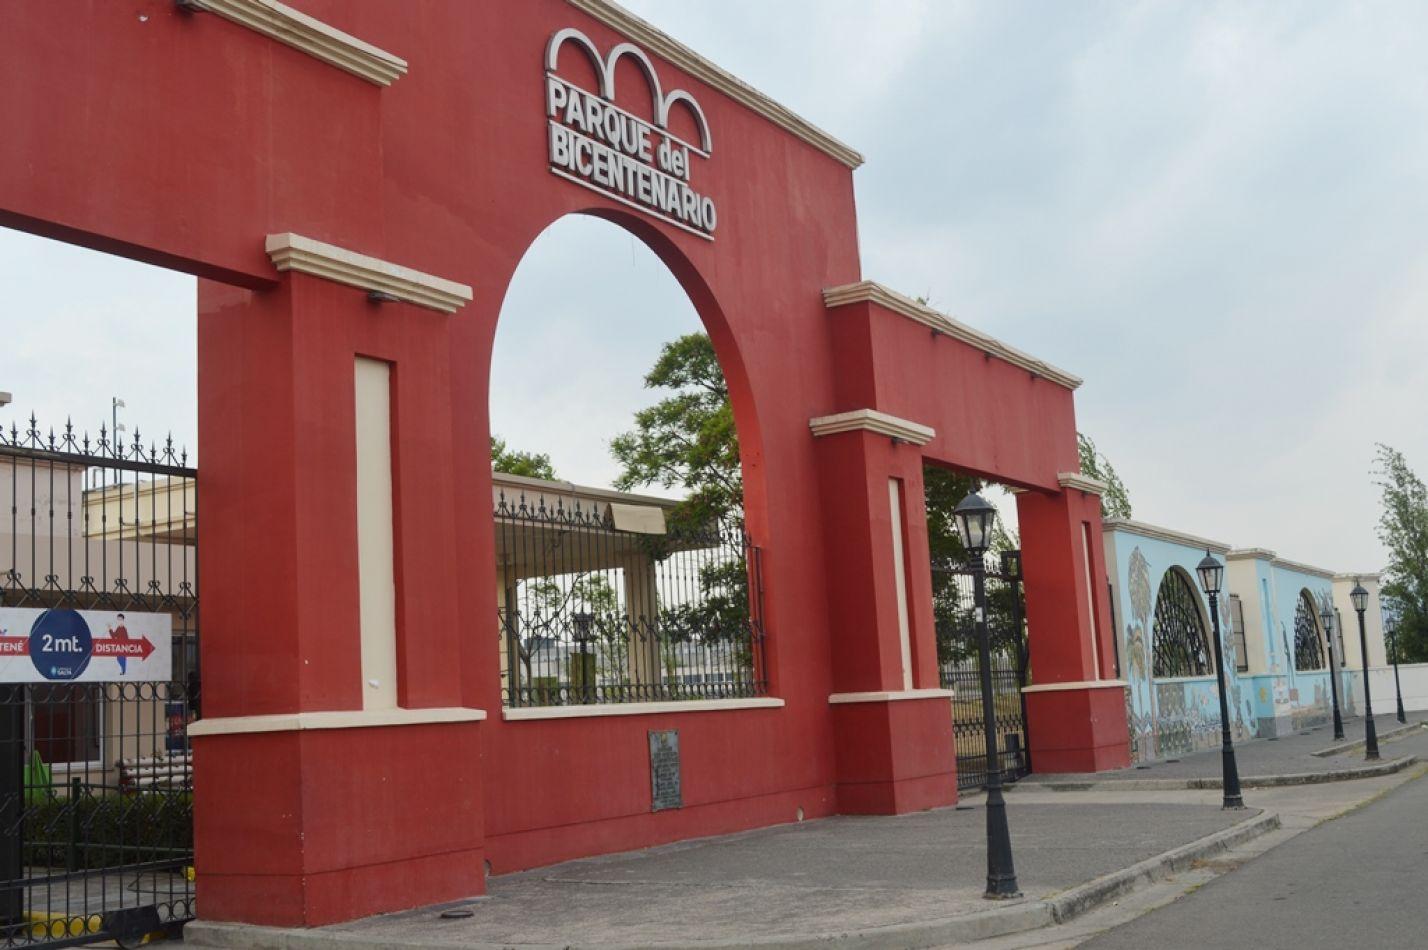 La Municipalidad solicitó la apertura de dos parques de la ciudad